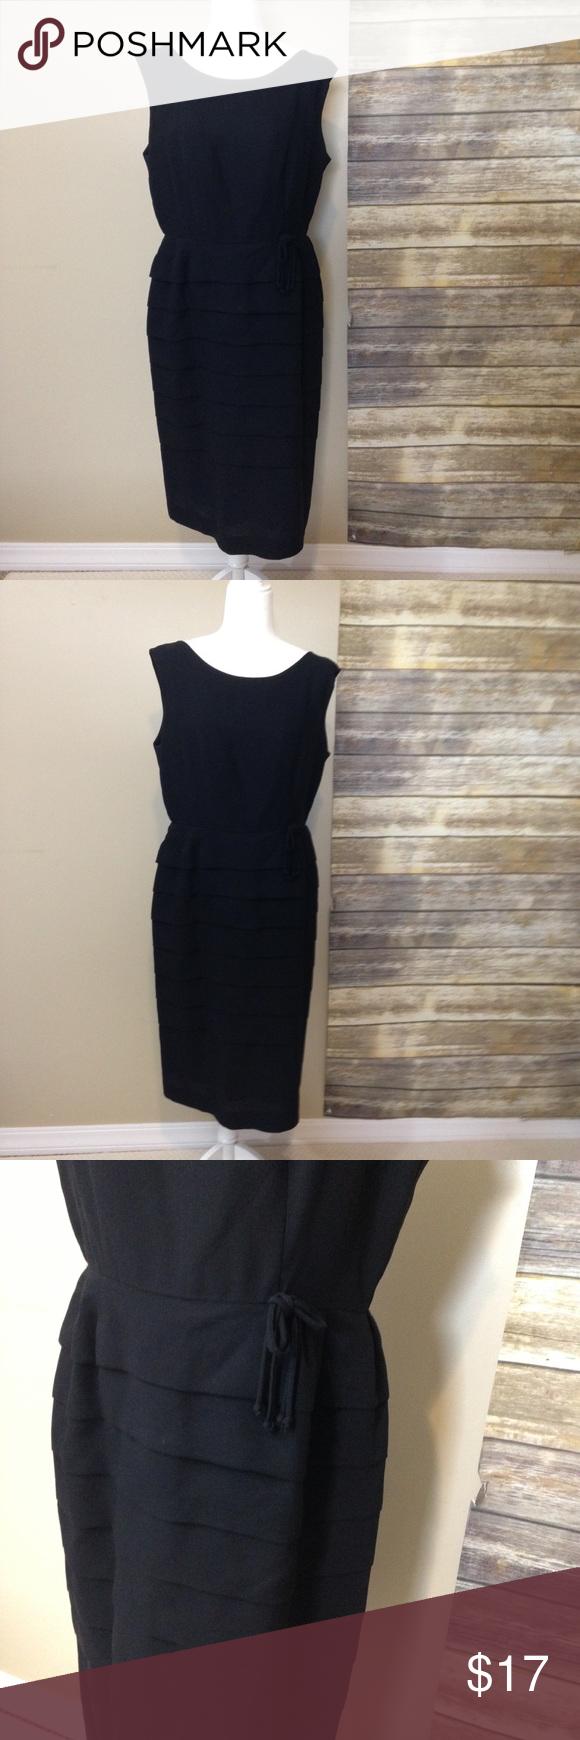 Black Sheath Dress Plus Size Solid Black Dress Fully Lined Back Zipper Tie At Waist Is Decorative This Black Sheath Dress Solid Black Dress Homemade Dress [ 1740 x 580 Pixel ]